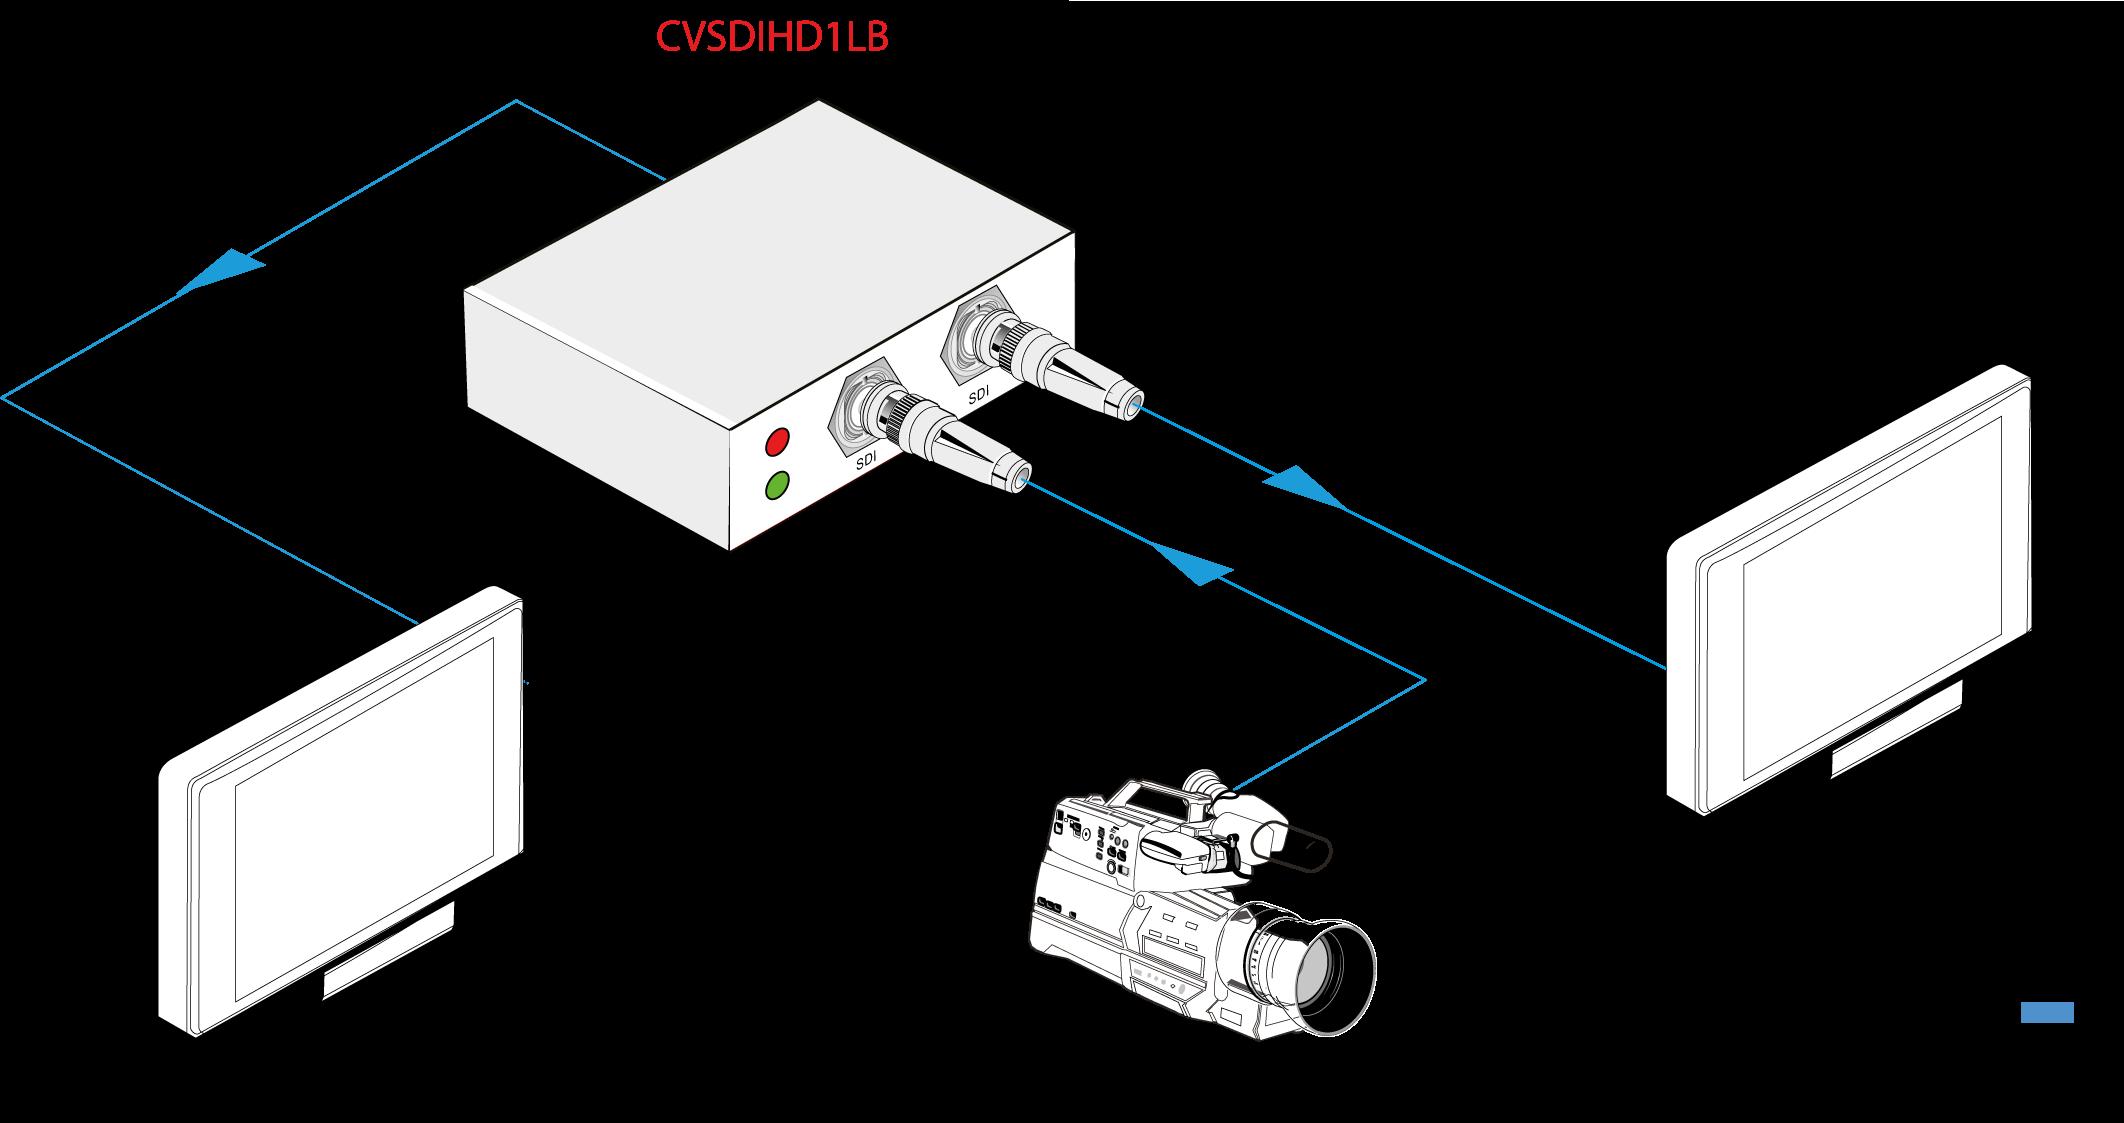 CVSDIHD1LB | Convertisseur 3G HD/SD/SDI vers 1 HDMI & 1 Loop SDI